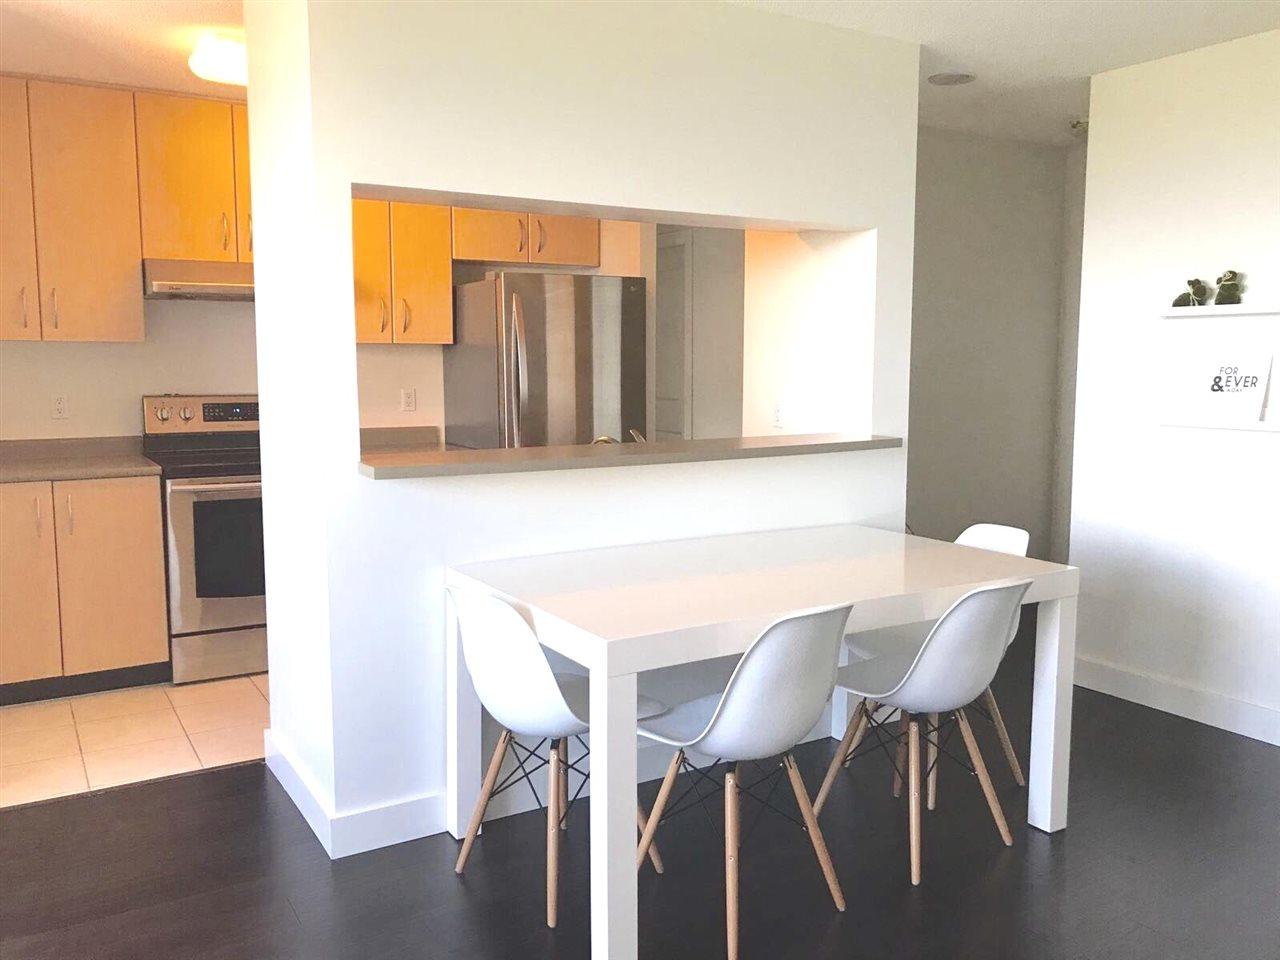 Condo Apartment at 1501 3663 CROWLEY DRIVE, Unit 1501, Vancouver East, British Columbia. Image 5